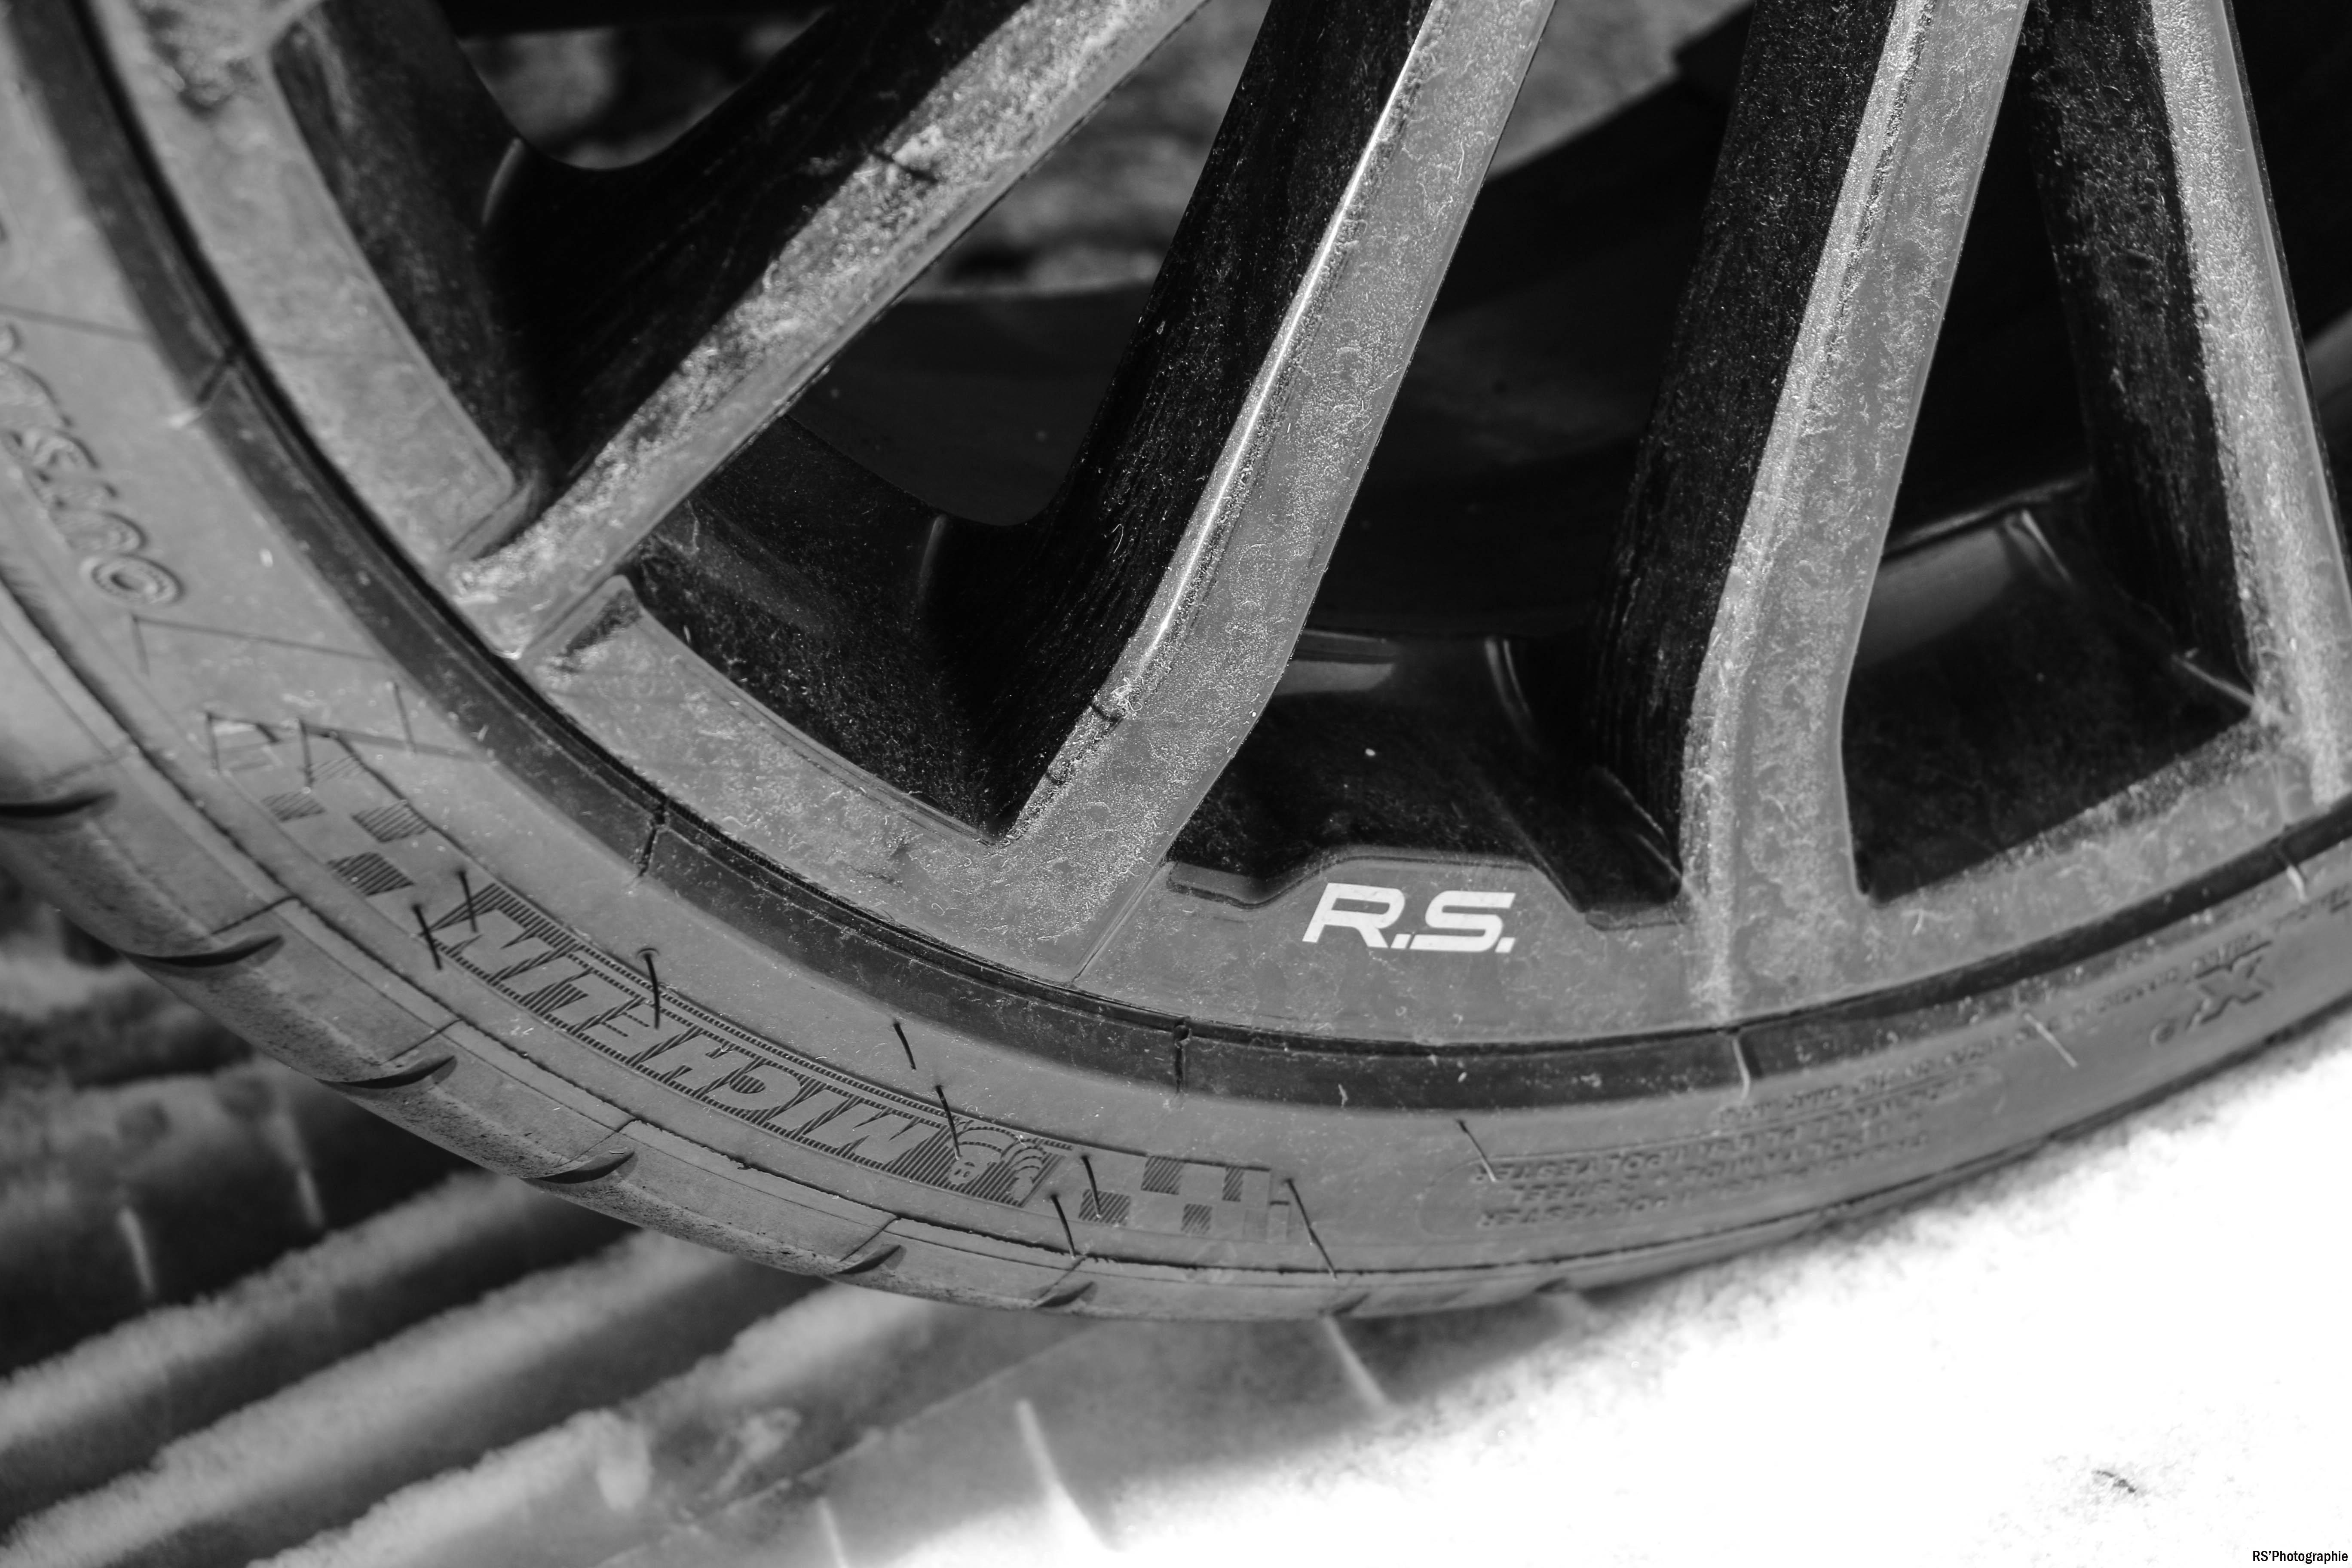 RenaultclioIVRSTrophy26-renault-clio-RS-trophy-jante-rim-Arnaud Demasier-RSPhotographie